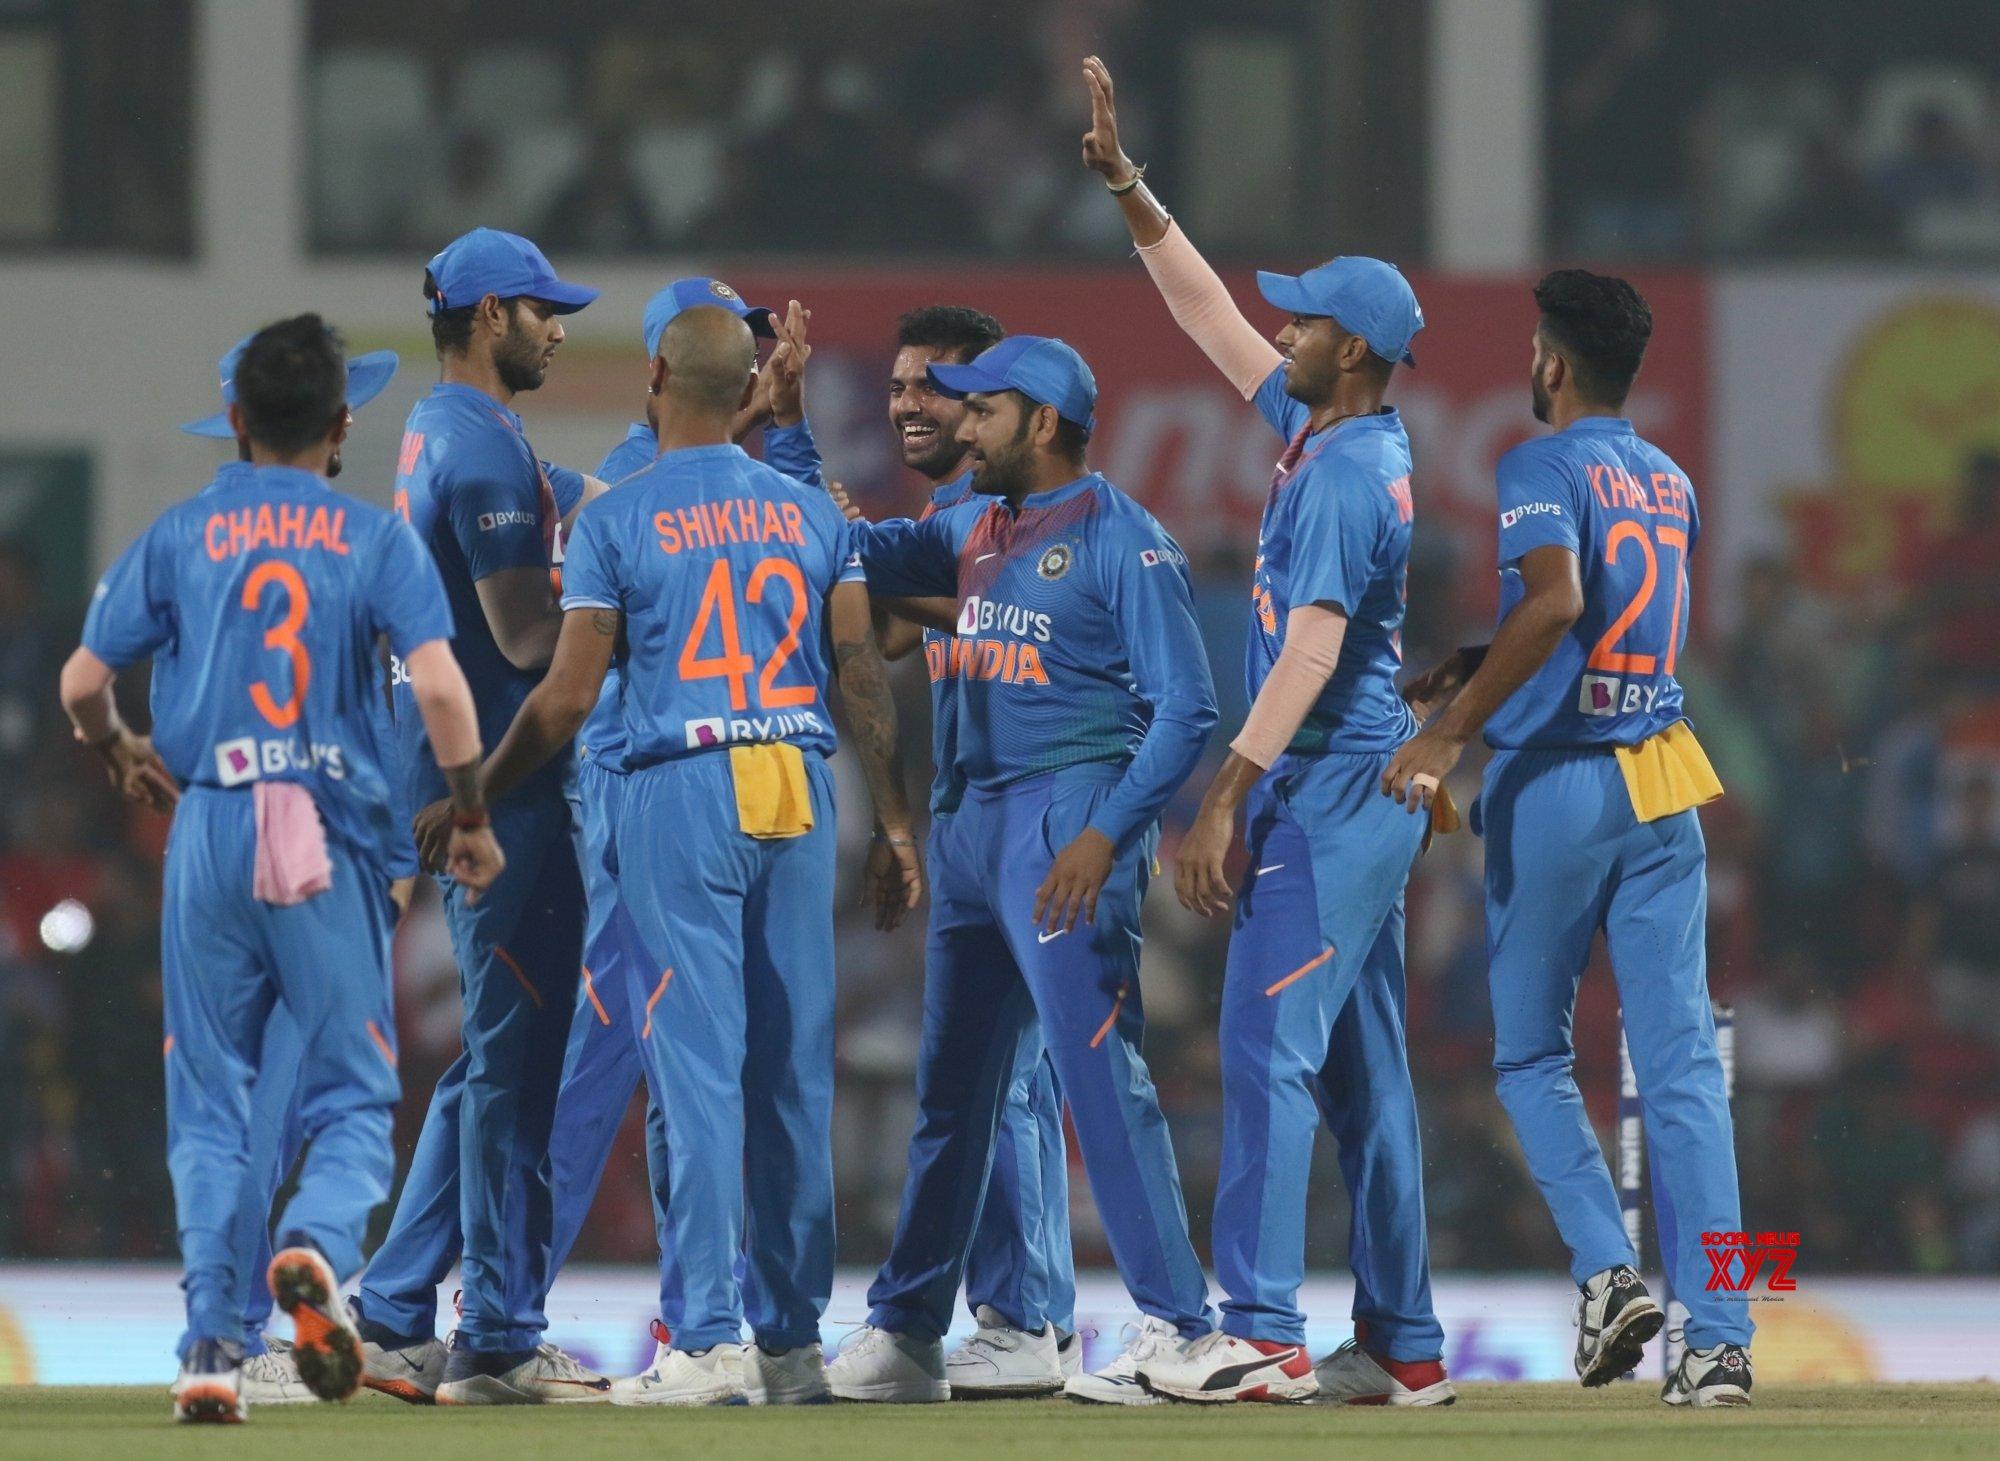 Nagpur: 3rd T20I - India Vs Bangladesh (Batch - 15) #Gallery